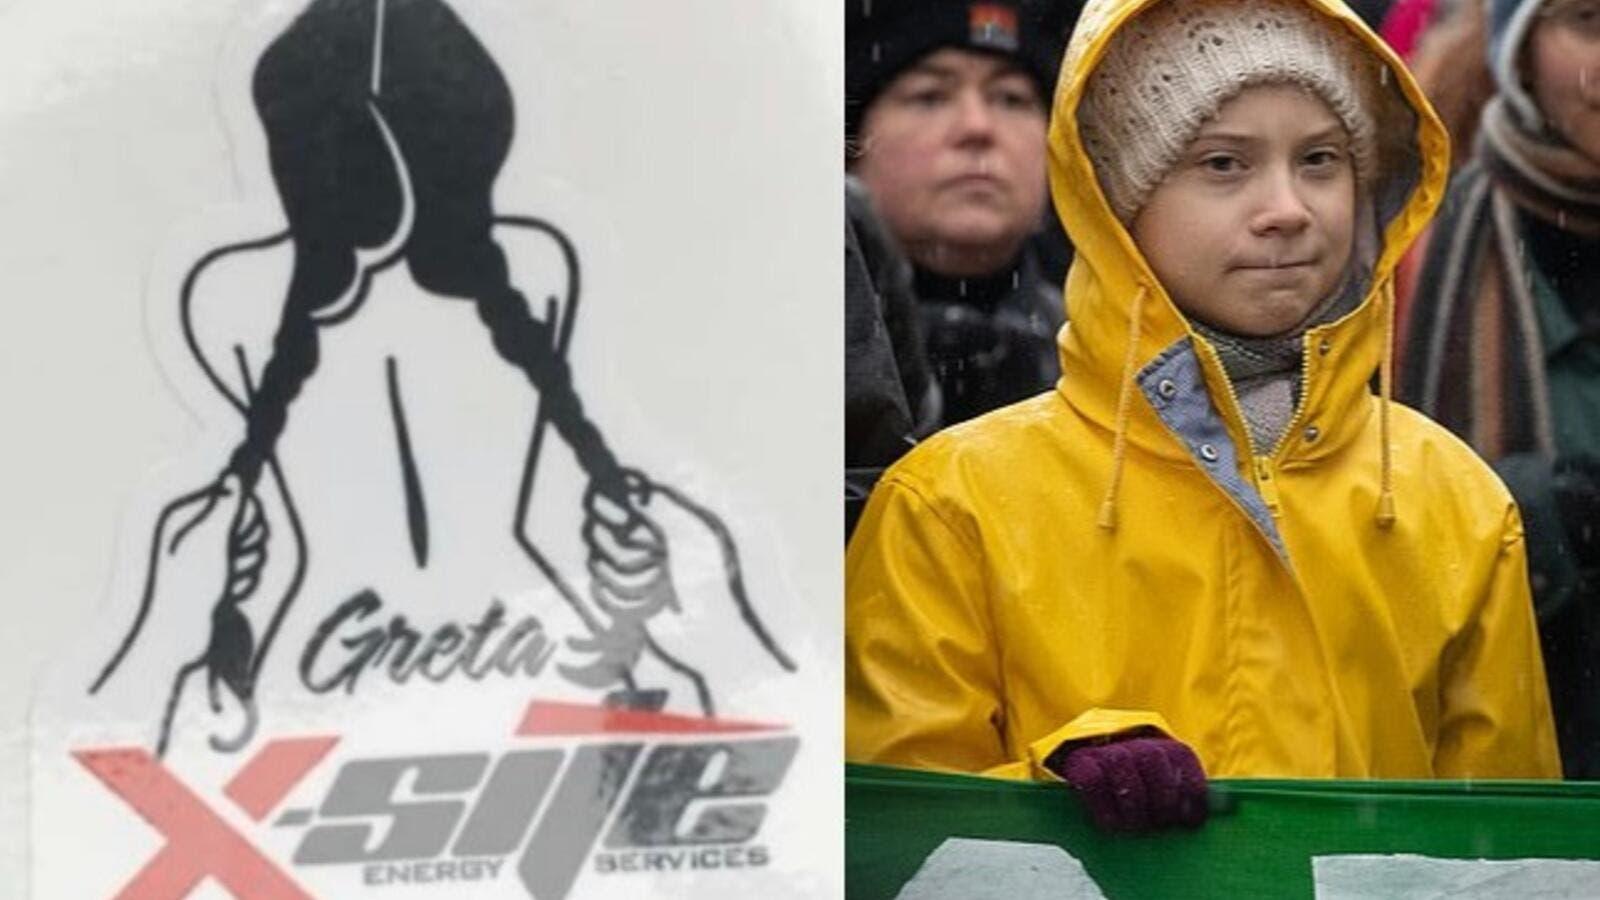 Canadian Oil Firm Under Fire After Sick Rape Cartoon Of Greta